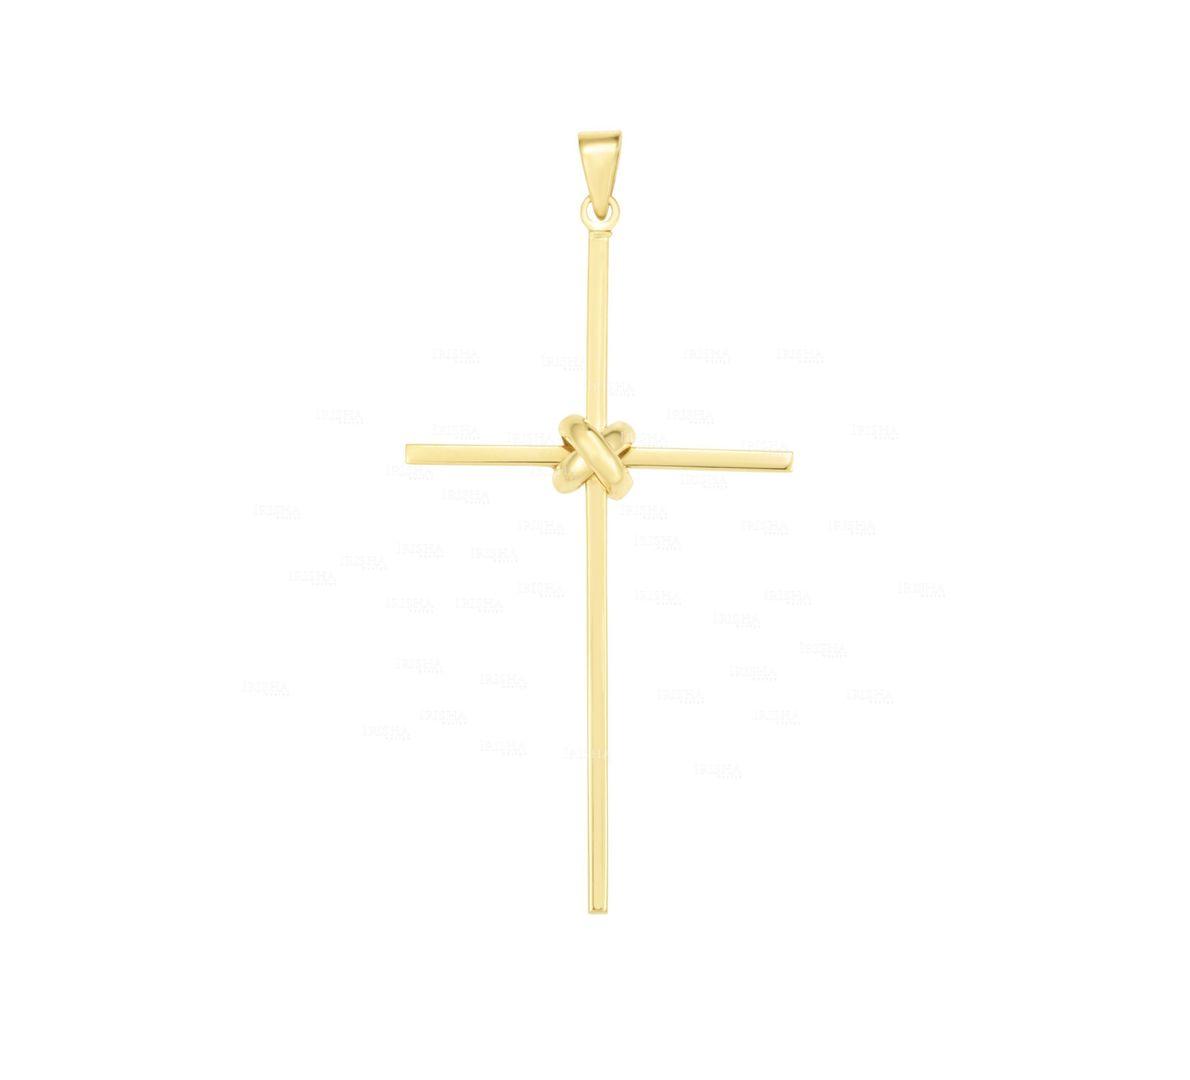 14K Solid Yellow Gold Knot Cross Jesus Piece Pendant Christmas Gift Fine Jewelry